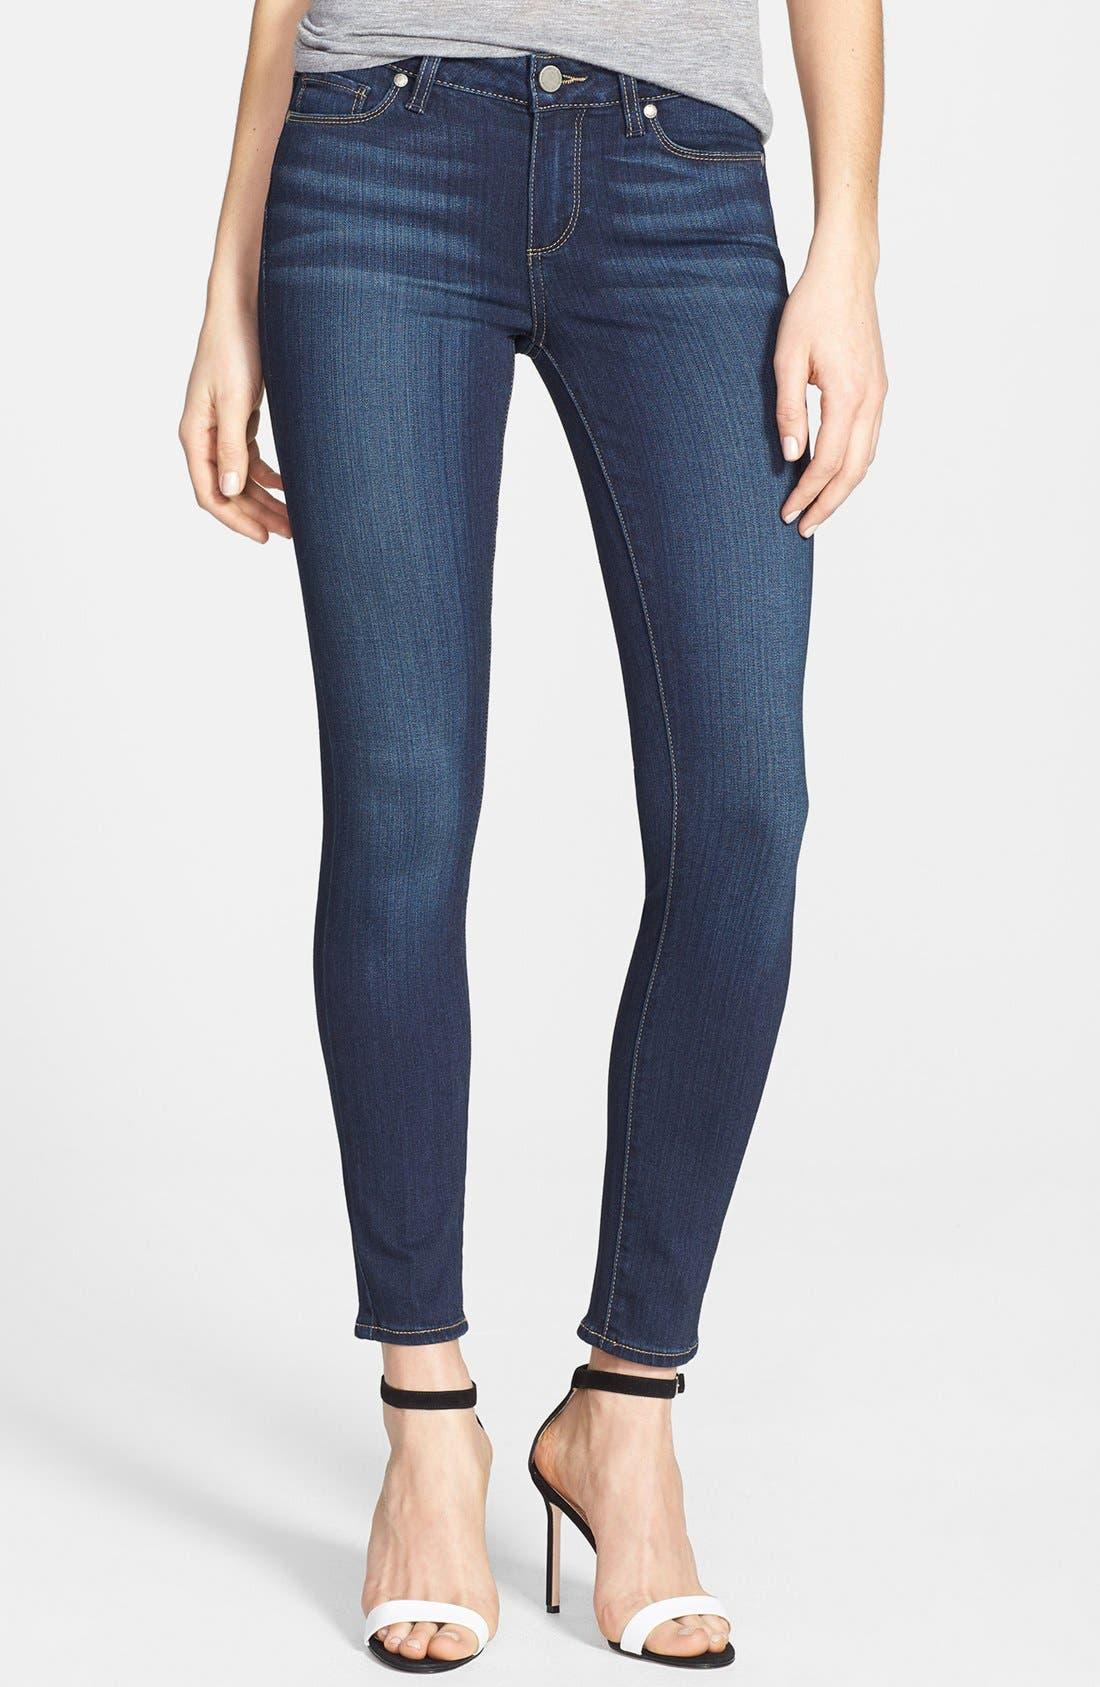 PAIGE Transcend - Verdugo Ankle Skinny Jeans (Nottingham)